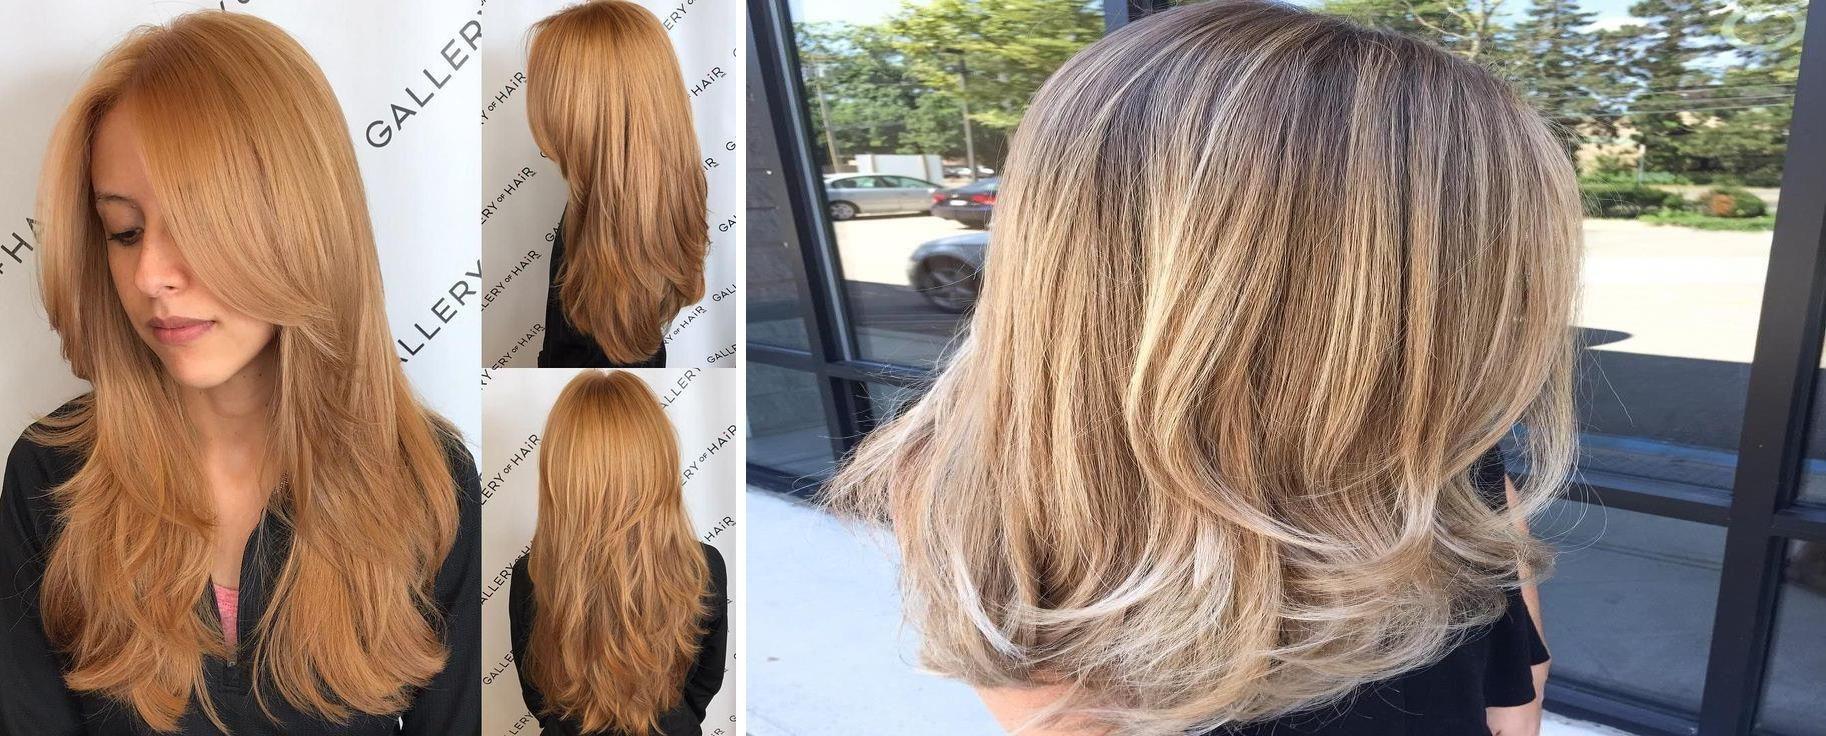 Hair Color For Straight Hair Regis Hair Short Hair Straight Hairstyles Straight Hairstyles Short Straight Hair Hair